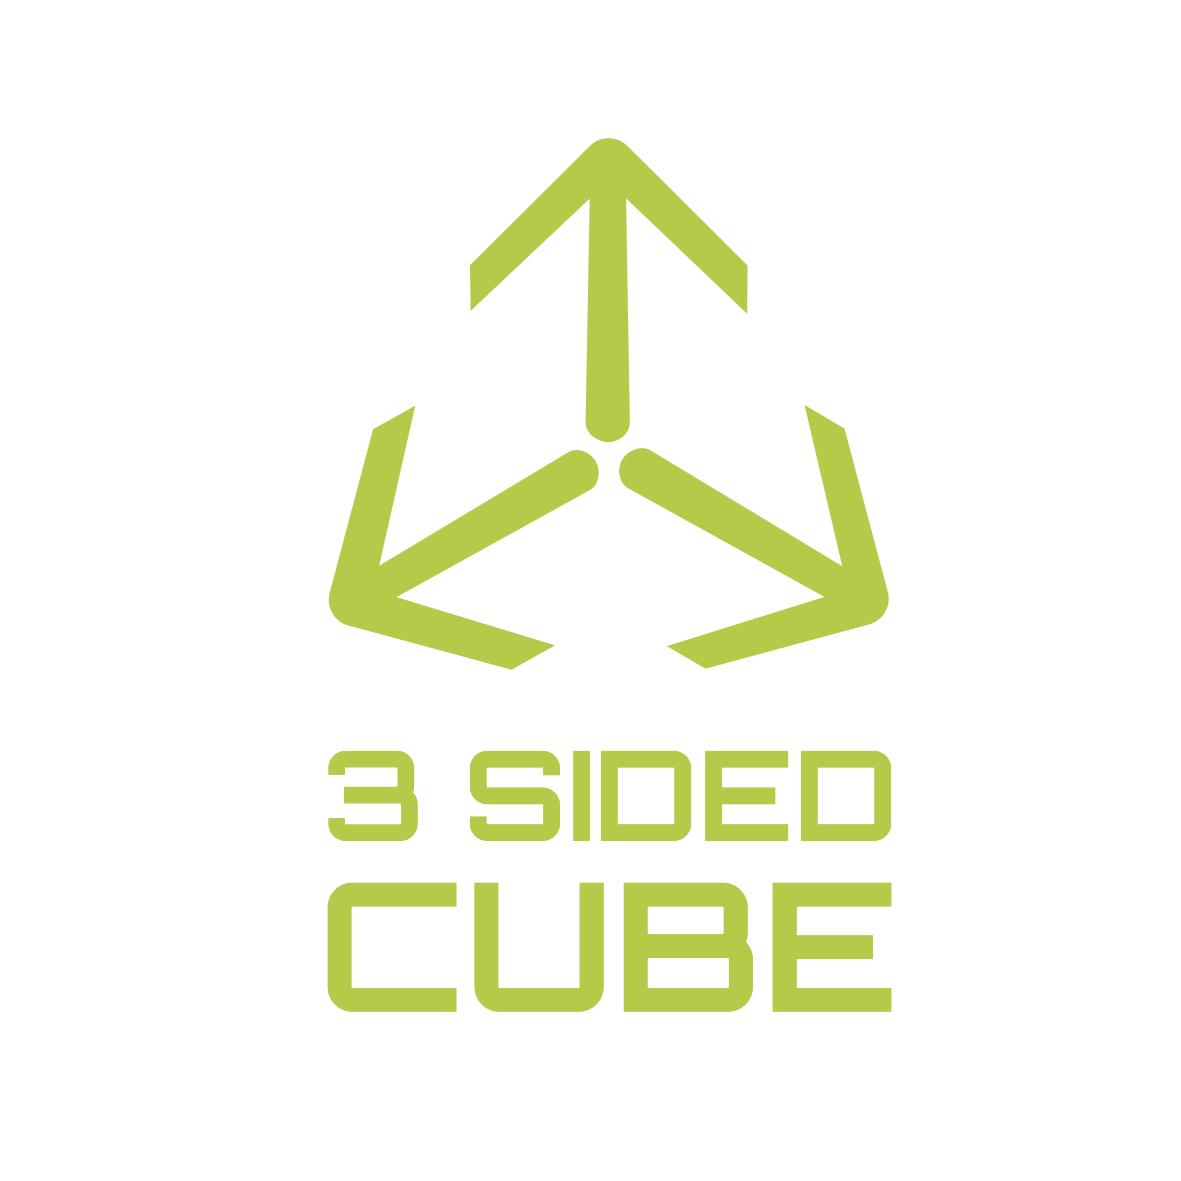 3 sided cube logo